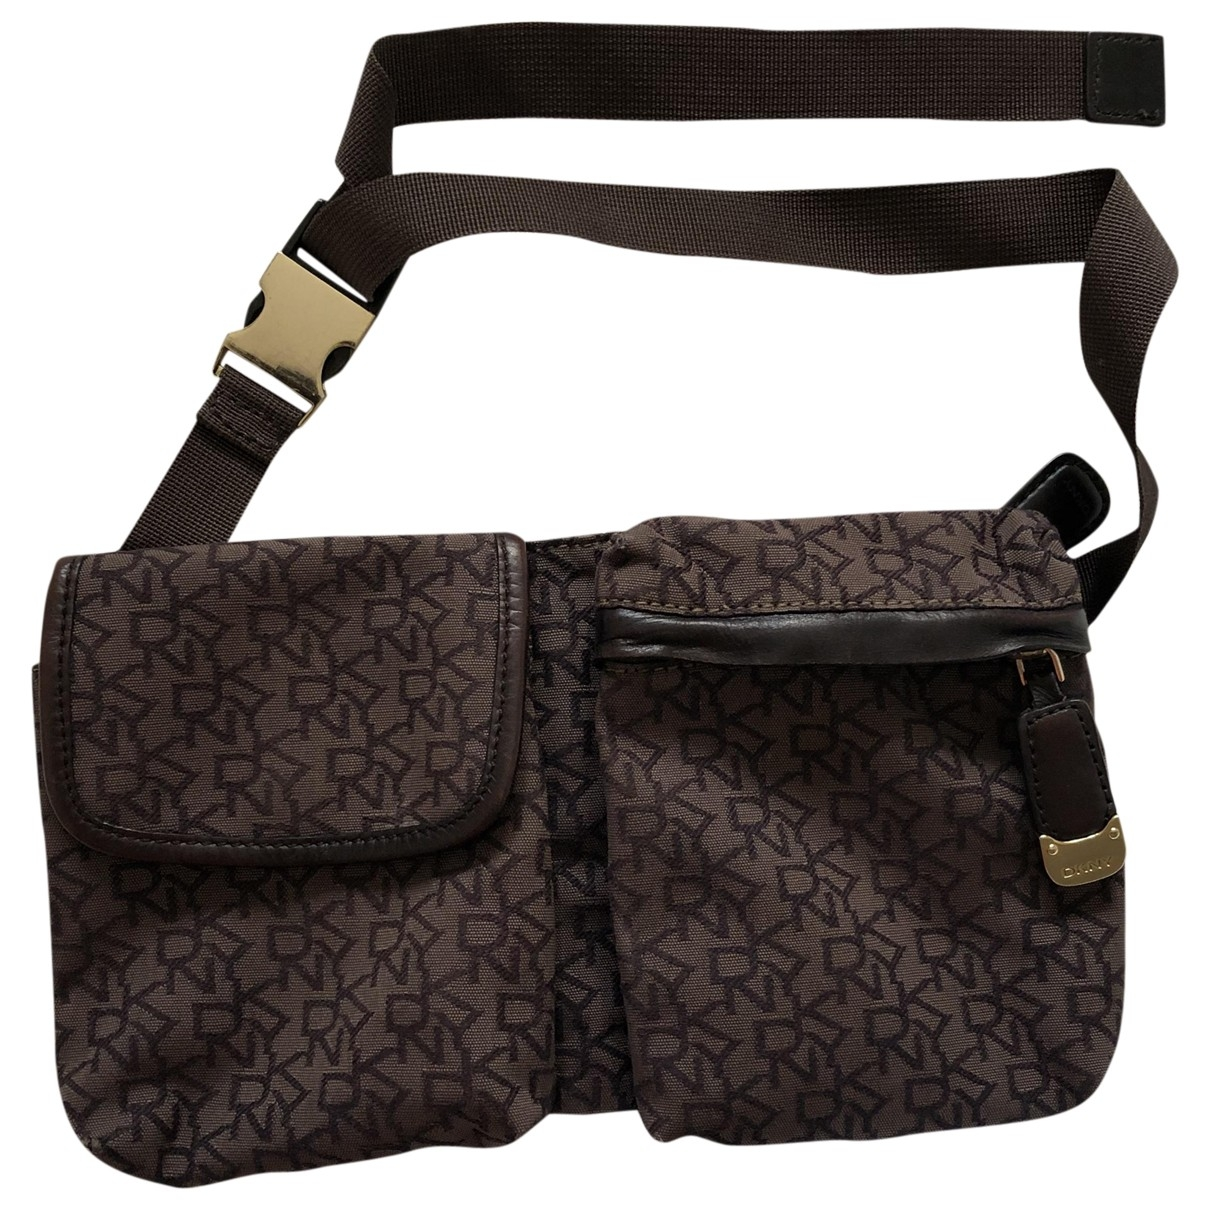 Dkny \N Brown Cotton handbag for Women \N